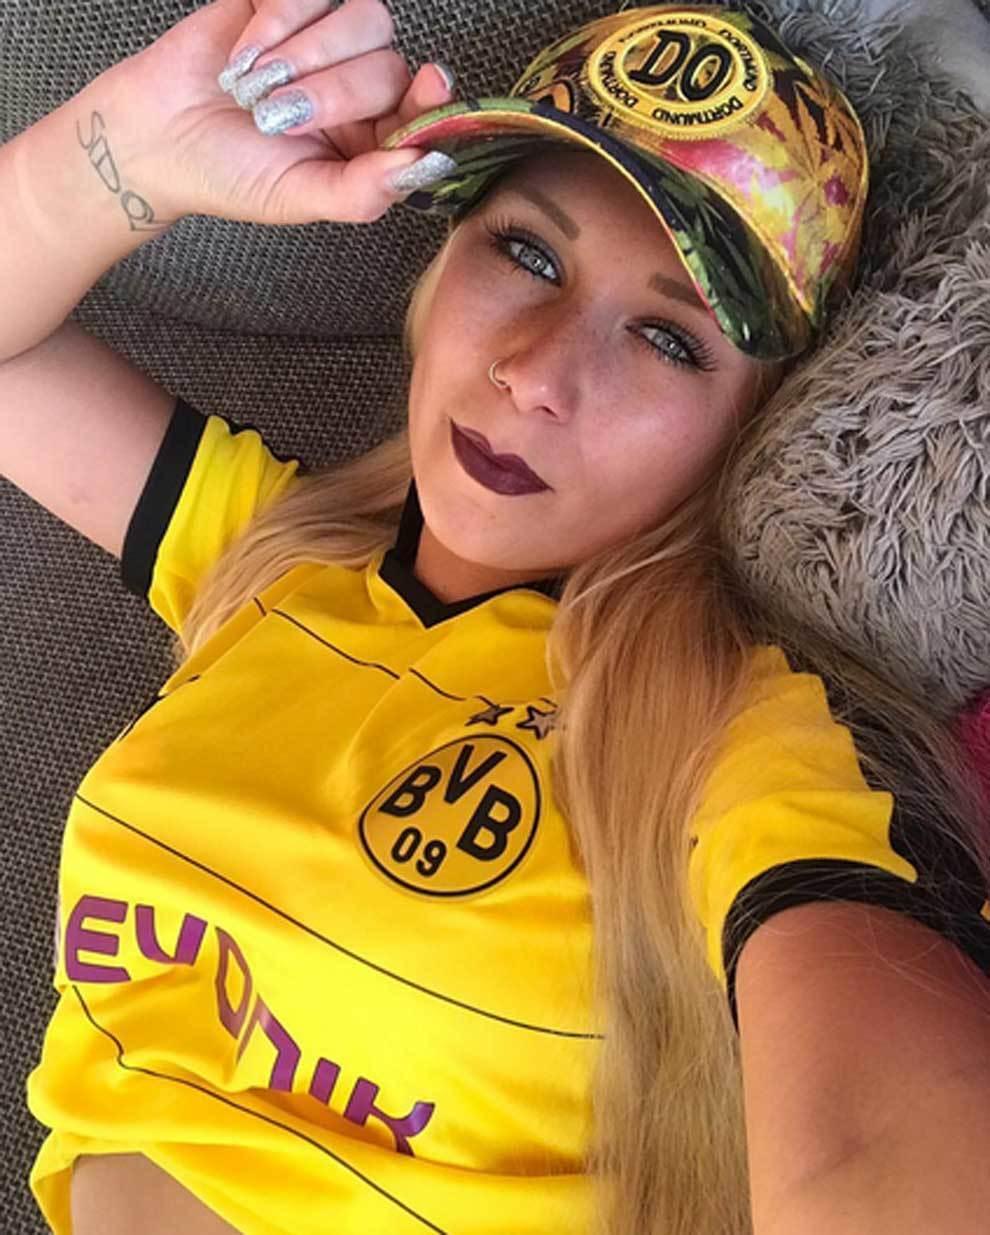 Bundesliga: Lena nitro, reputada actriz de cine para